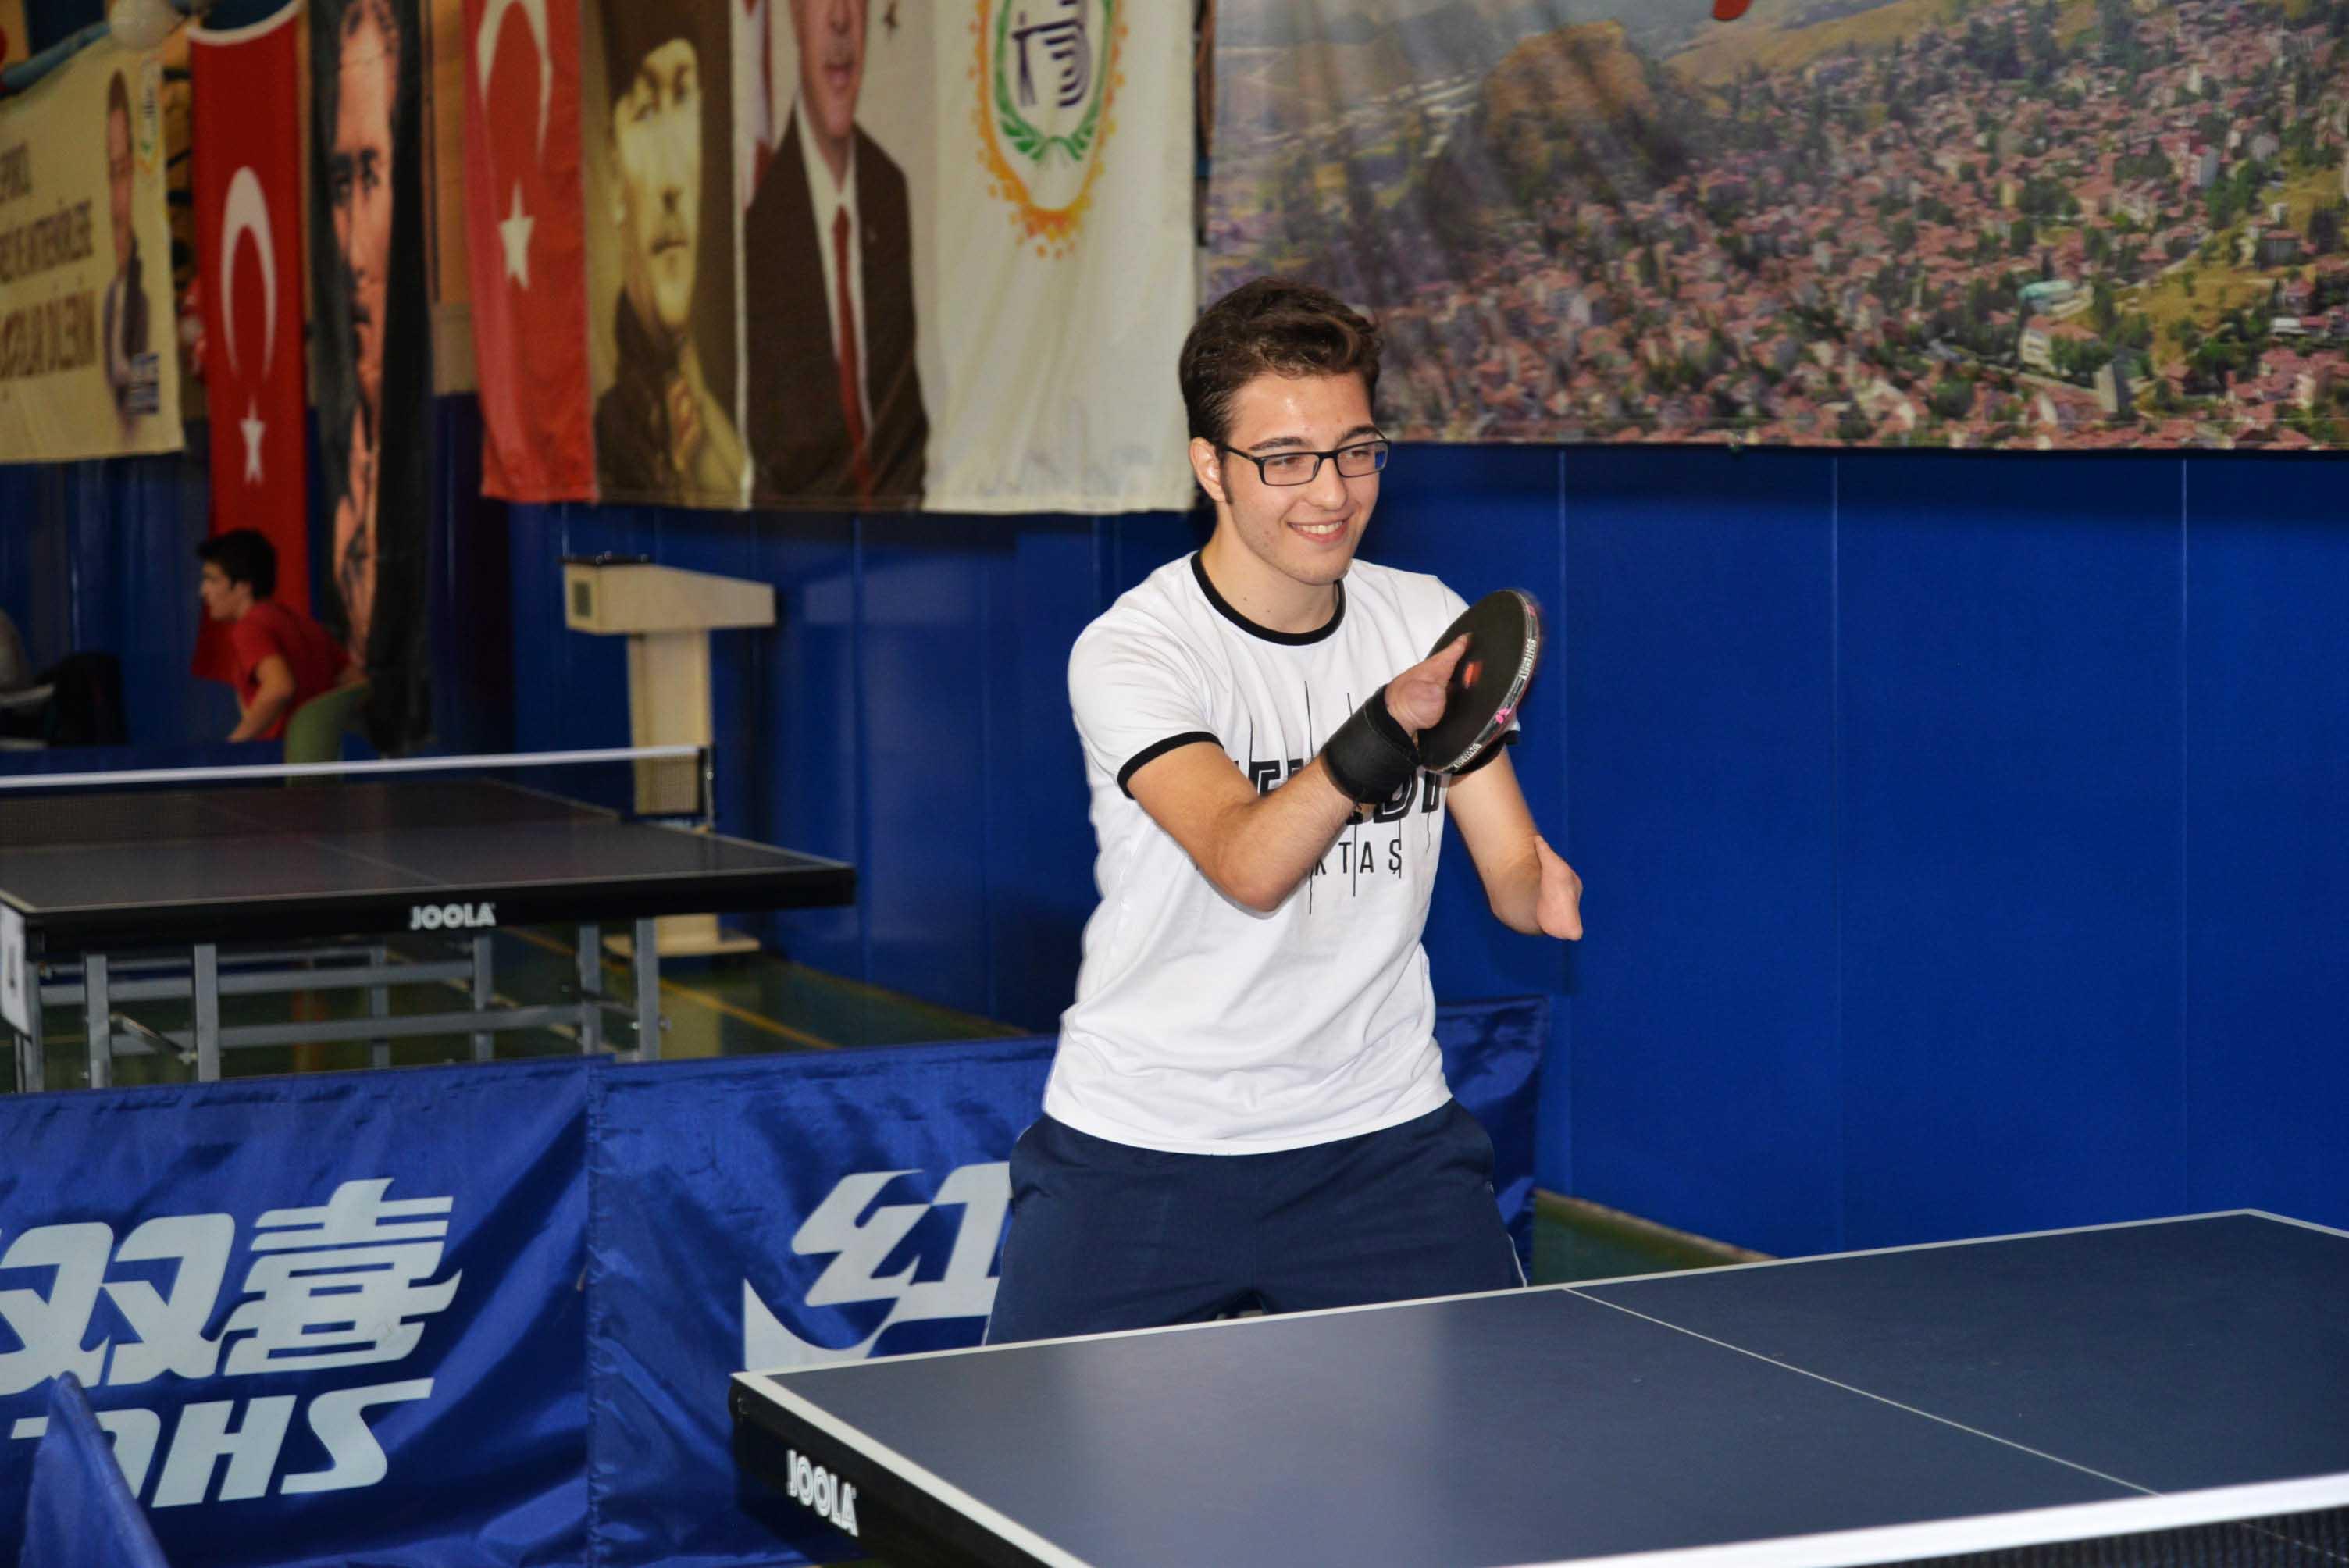 29-ekim-gures-ve-masa-tenisi-turnuvalari-12.jpg